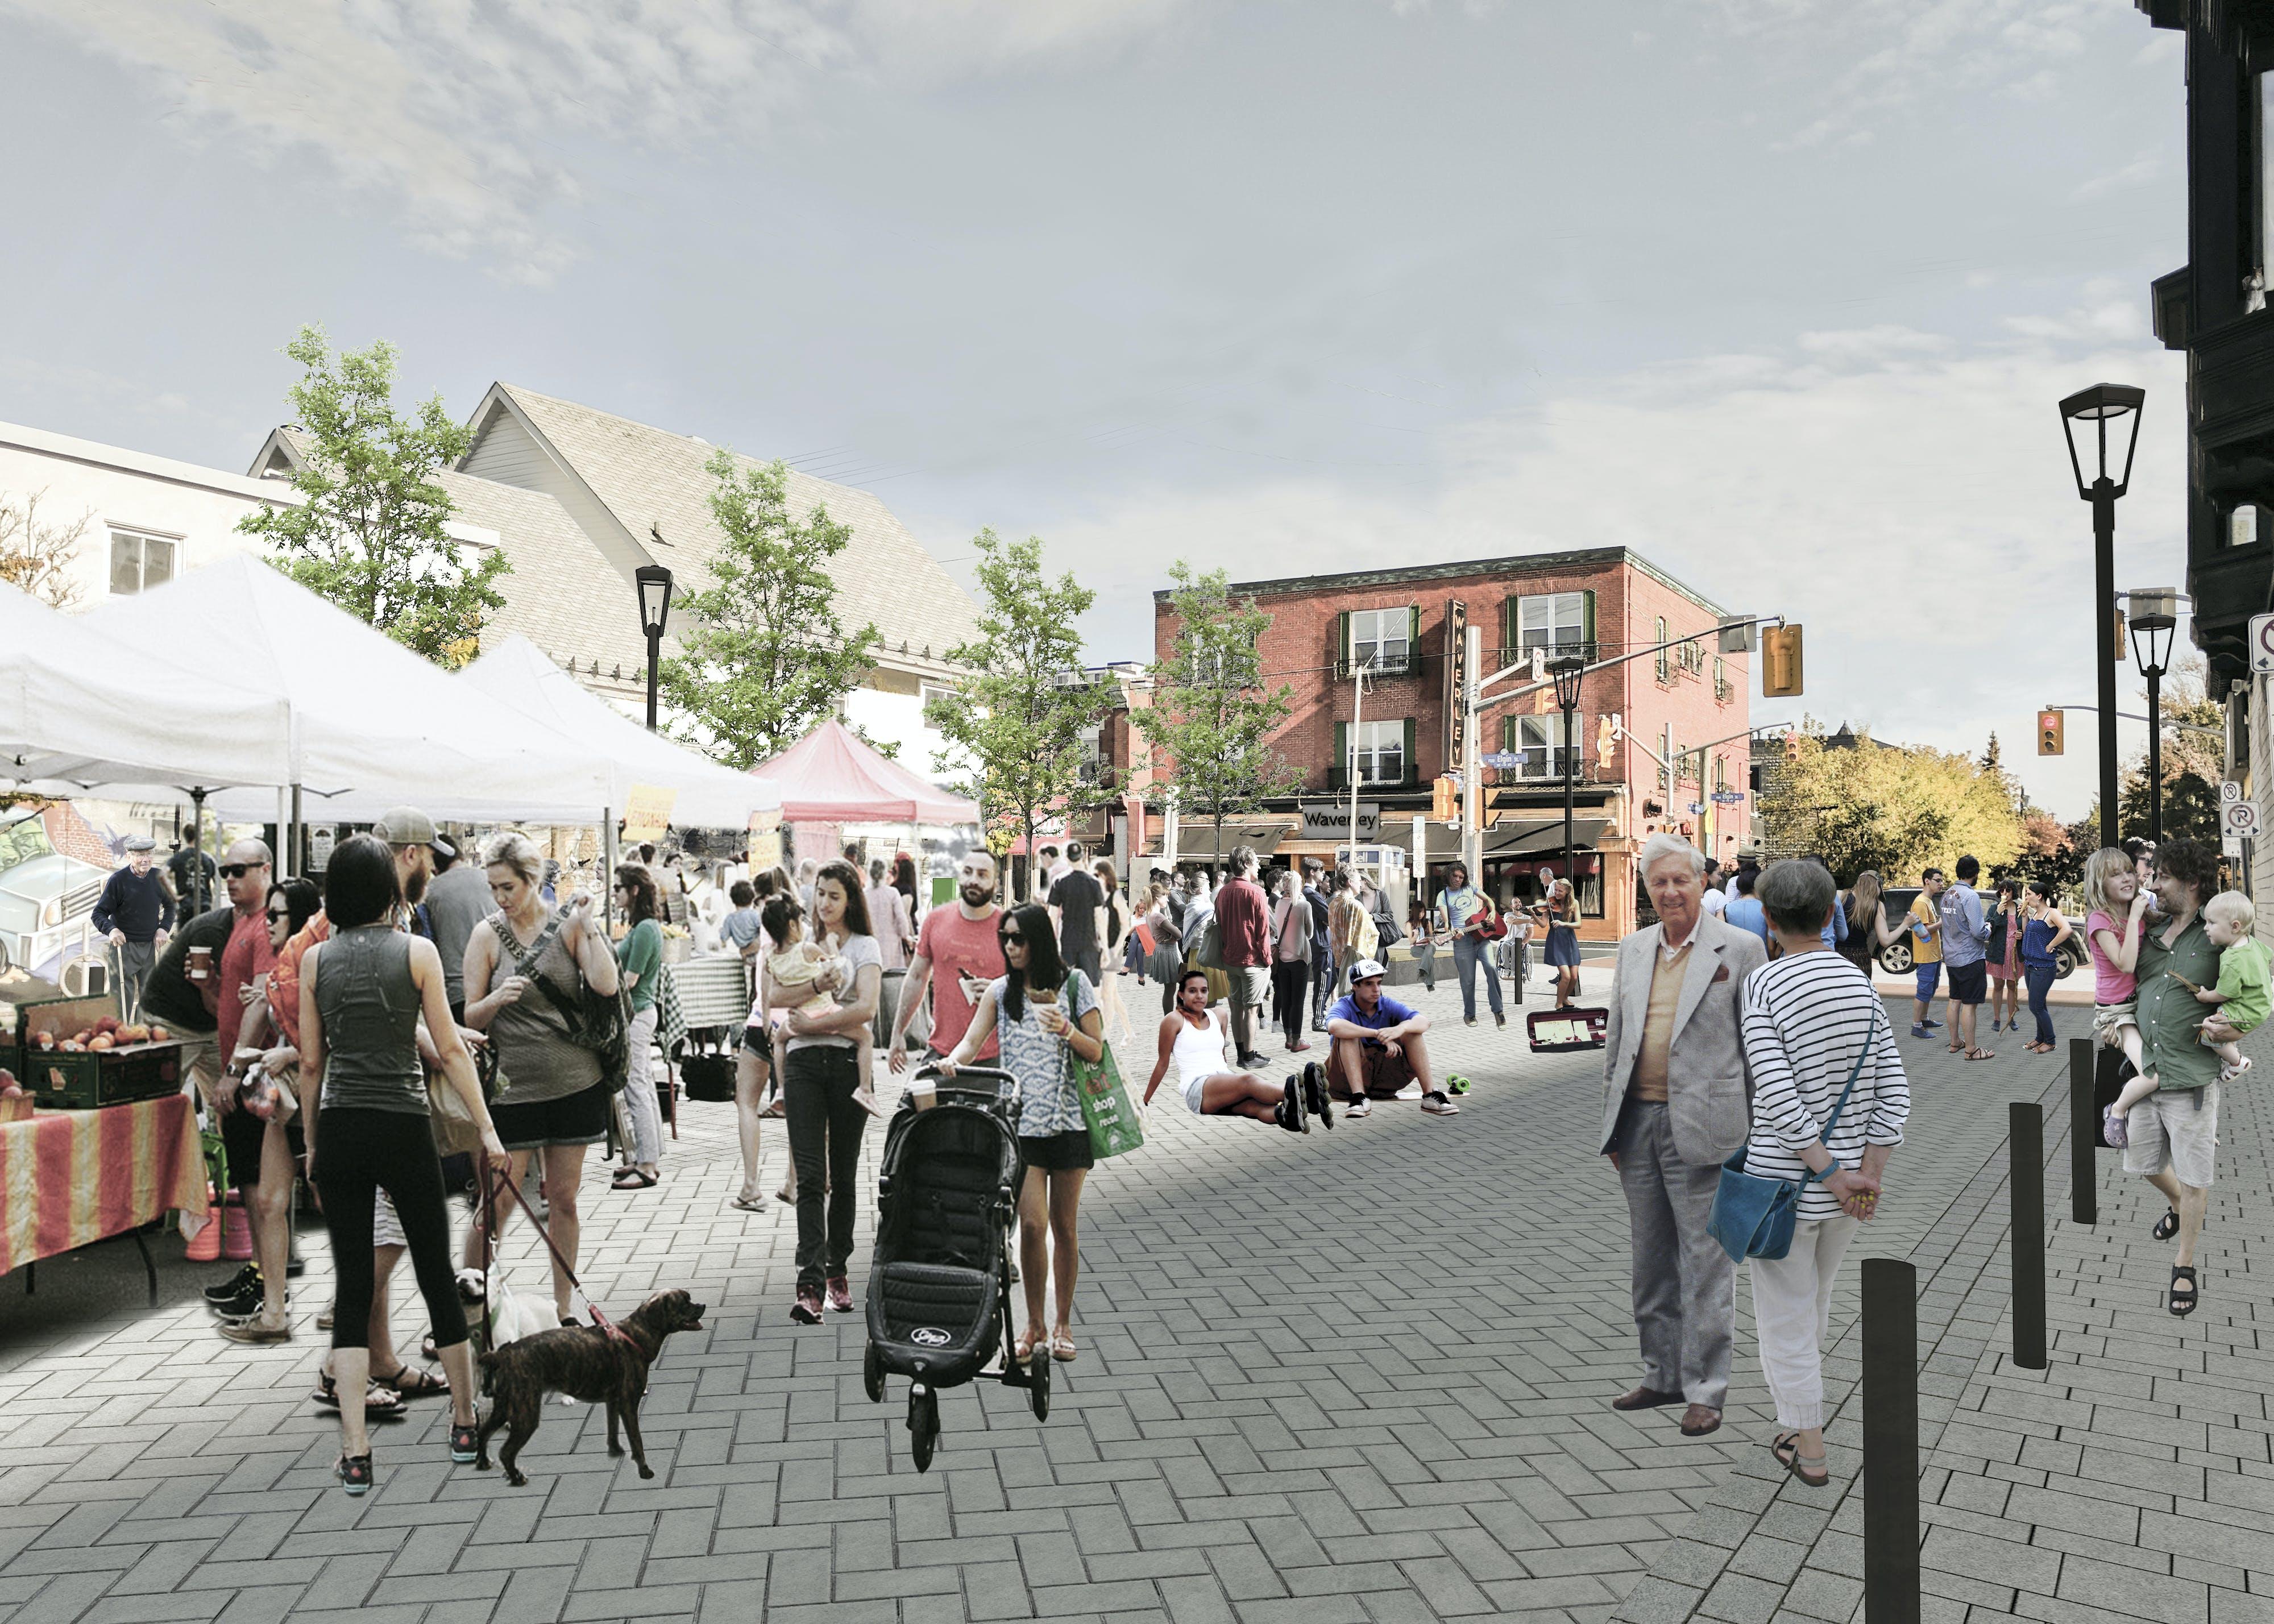 Waverley Plaza - Public Meeting